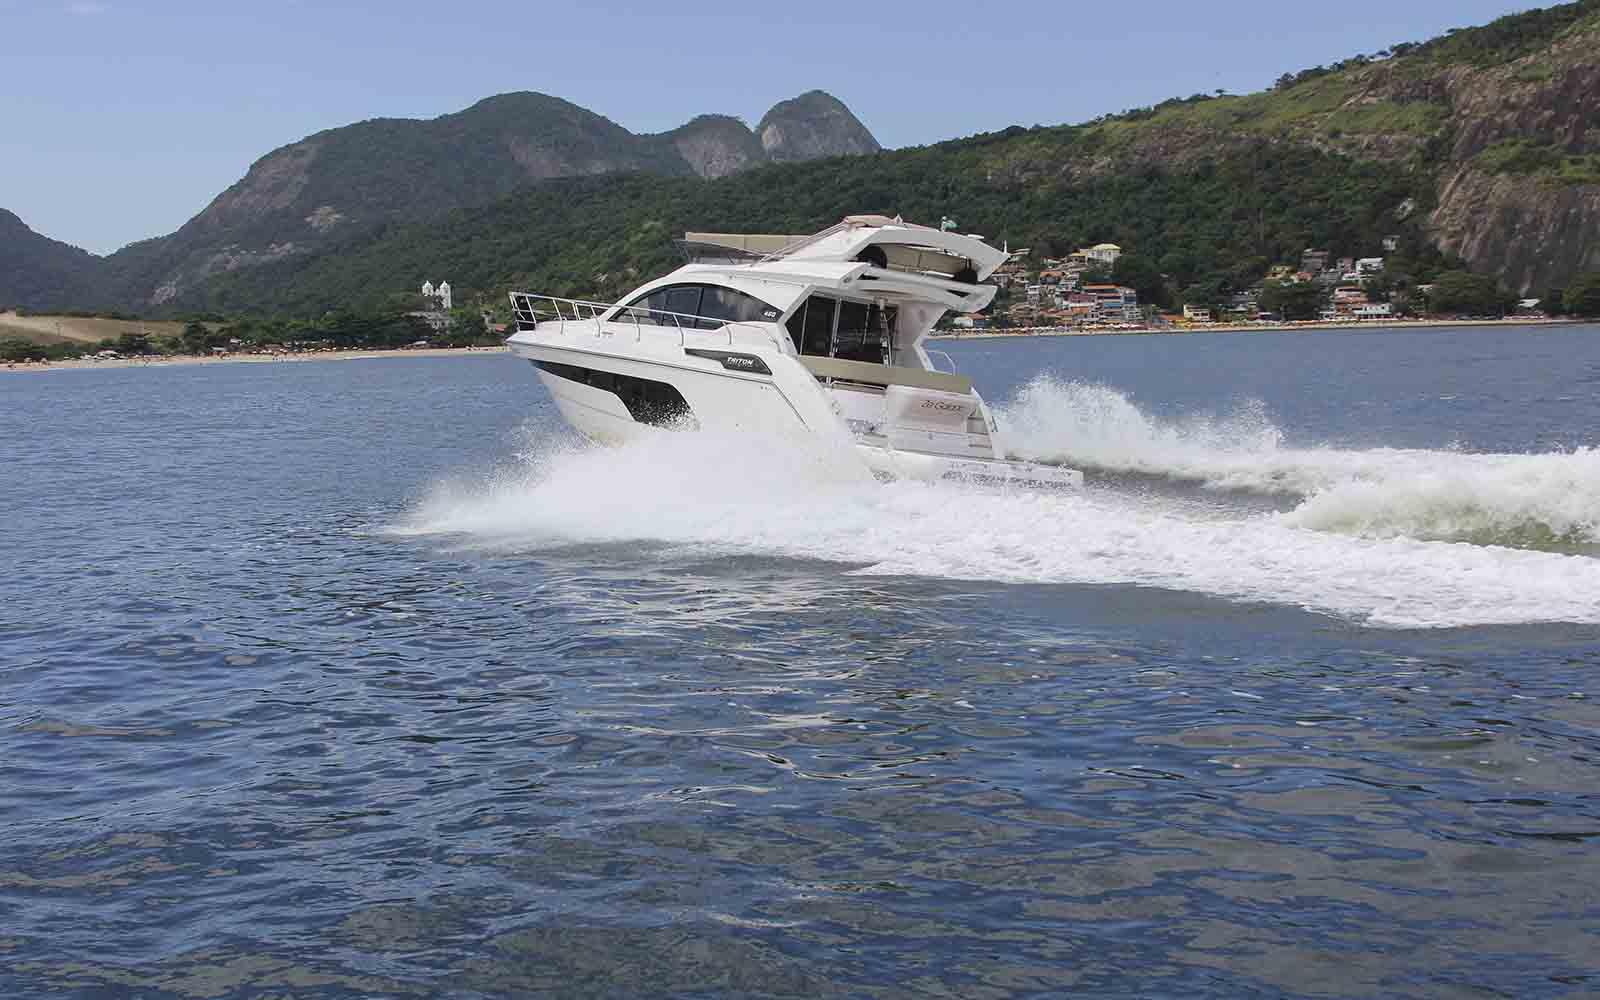 boat teste triton 460 fly - boat shopping